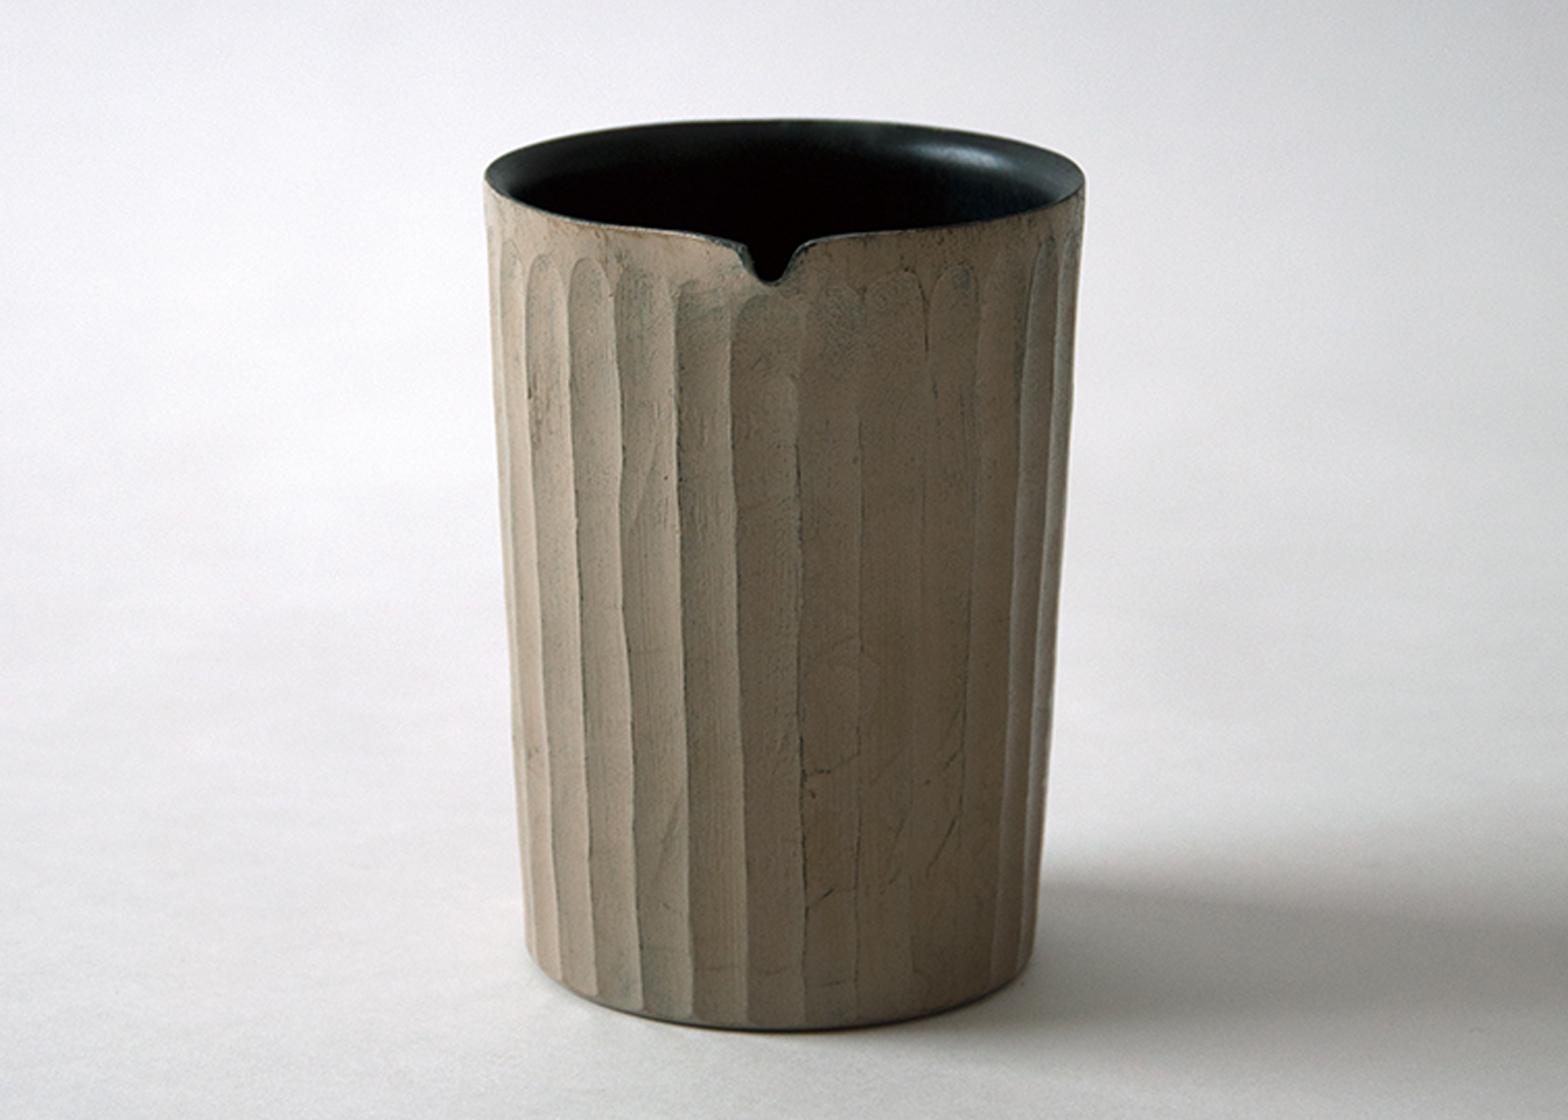 Tatazumai collection by Muji